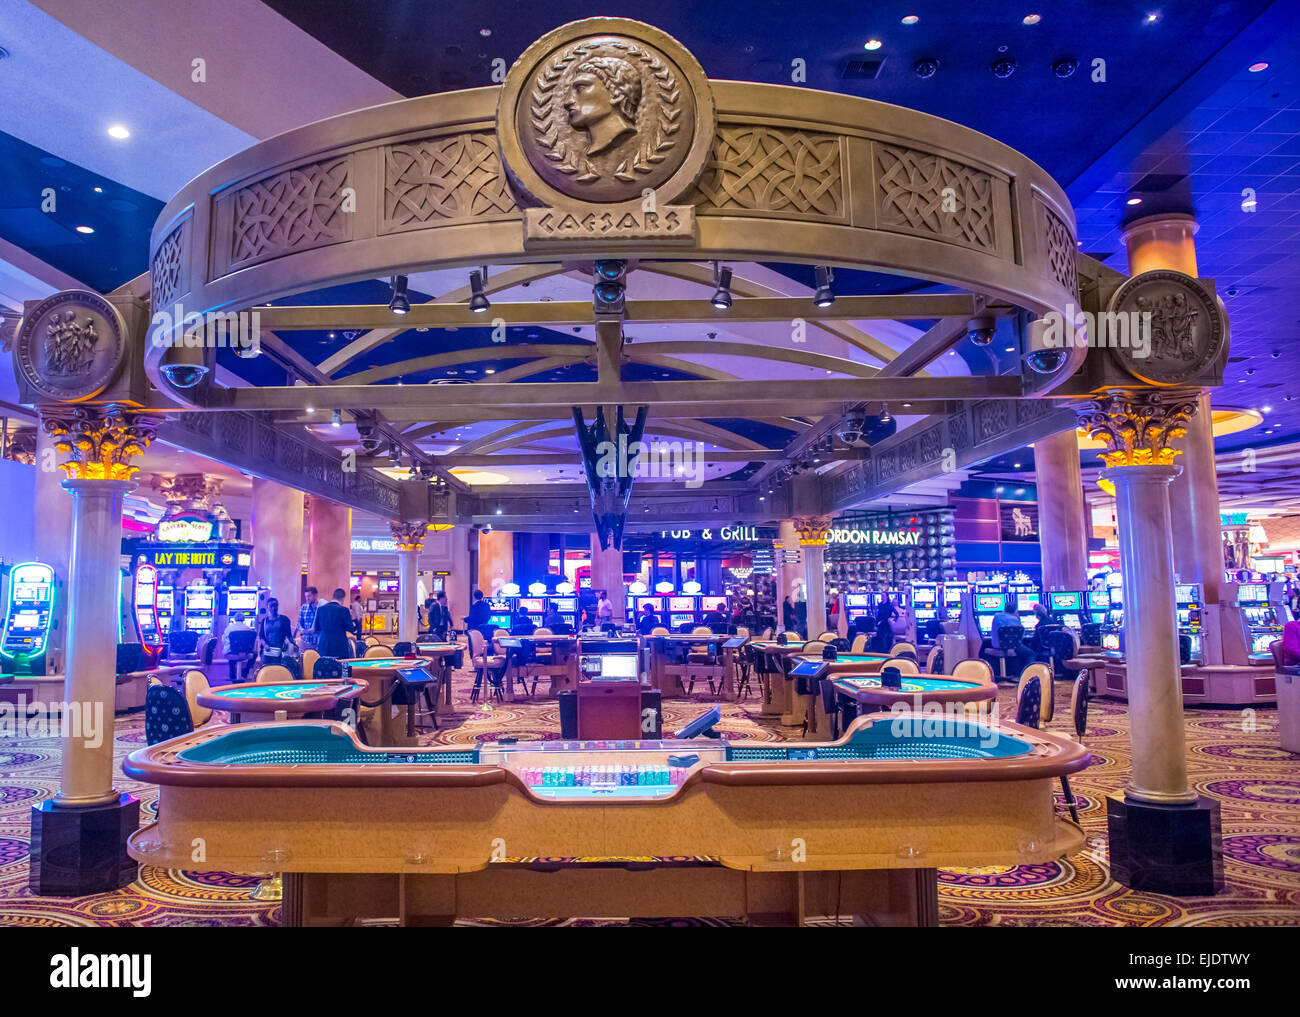 caesars palace casino in las vegas